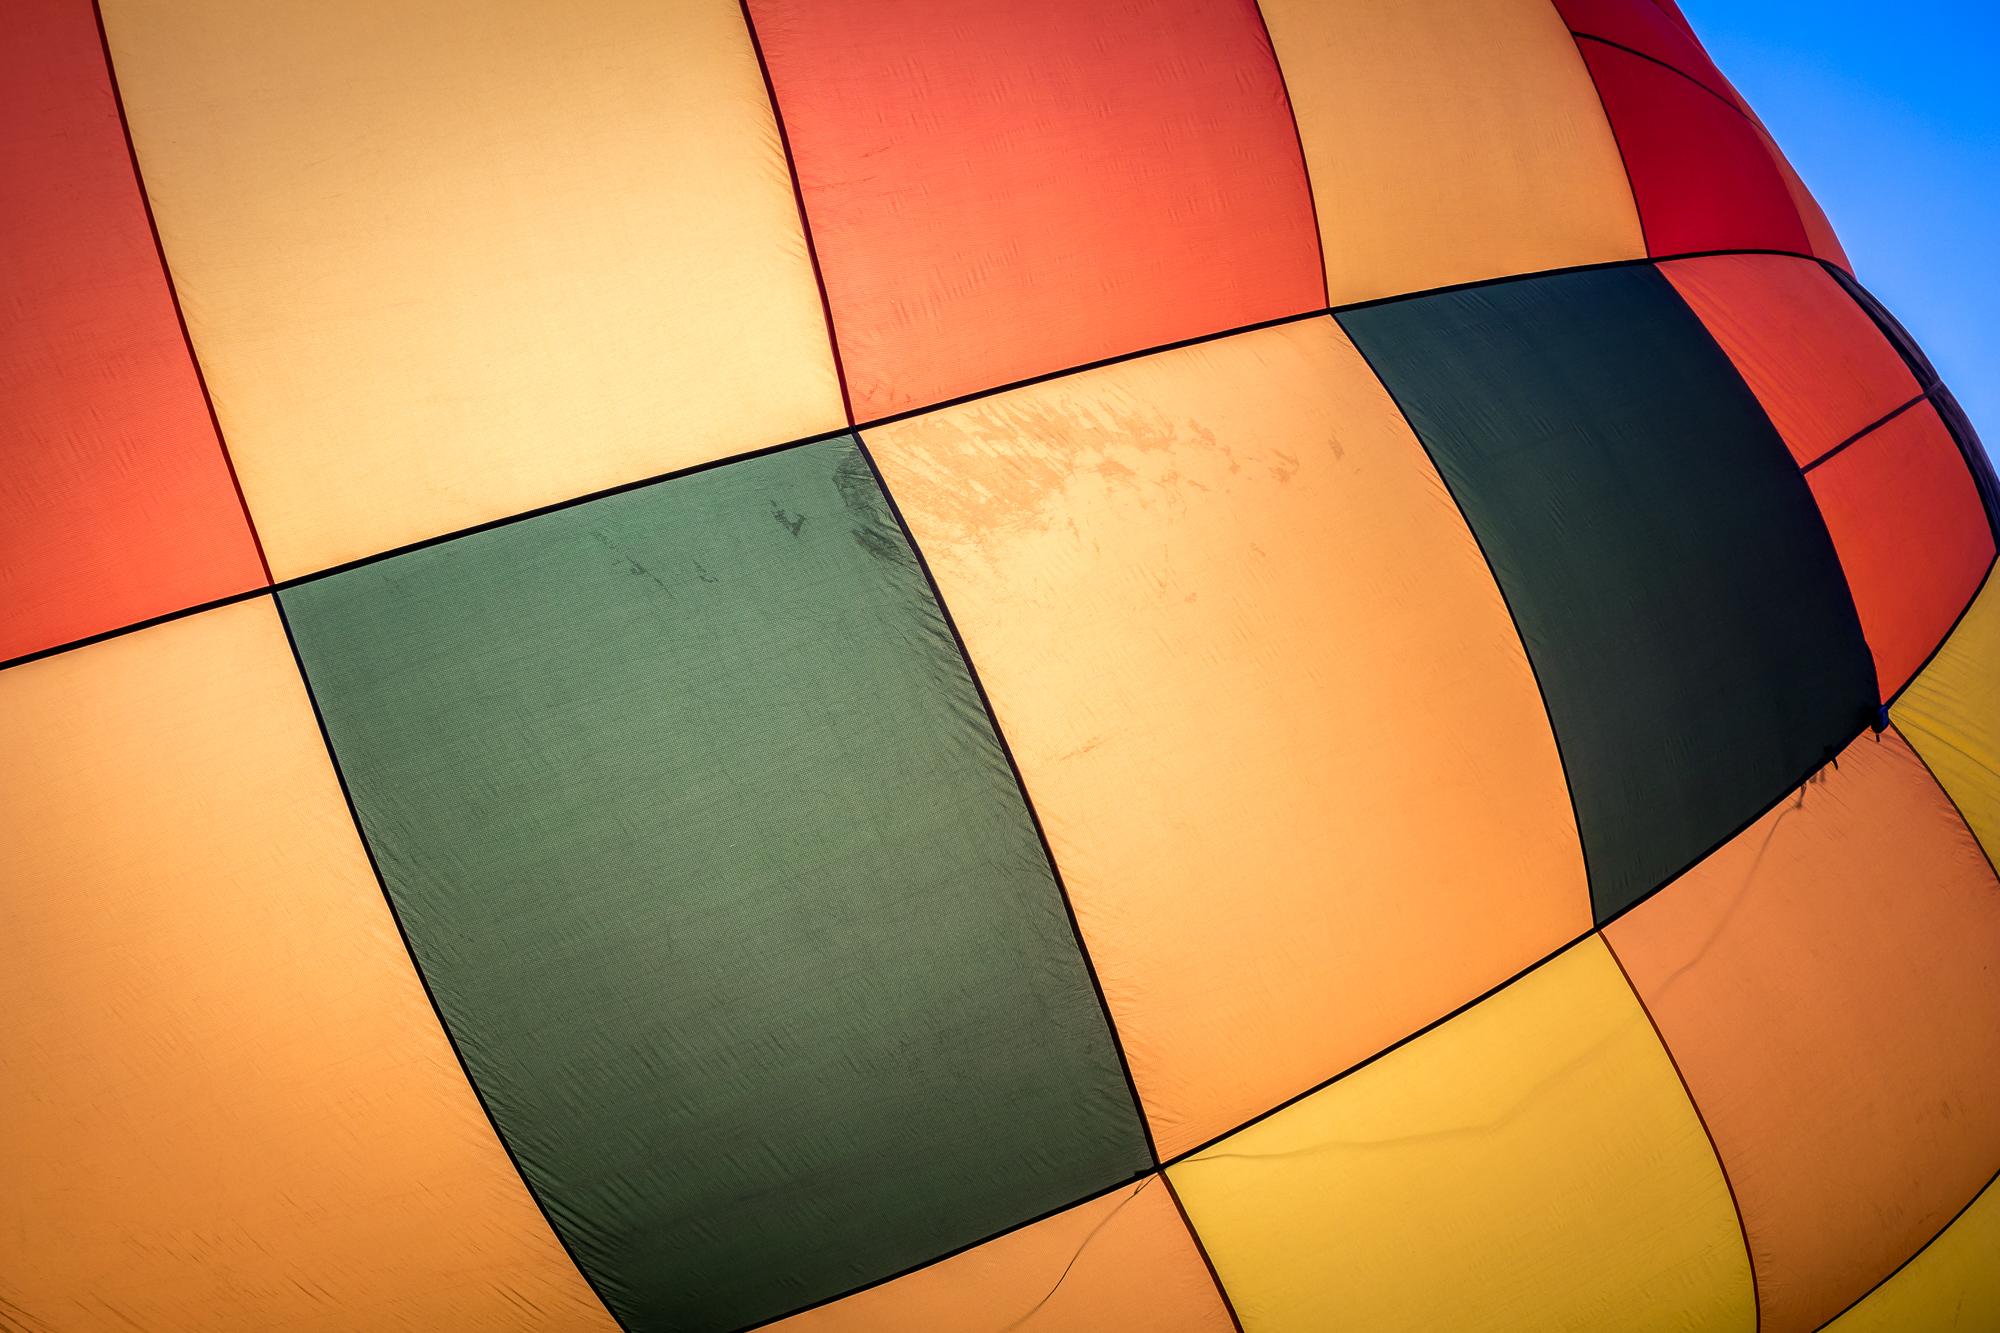 balloon-pattern-close.jpg